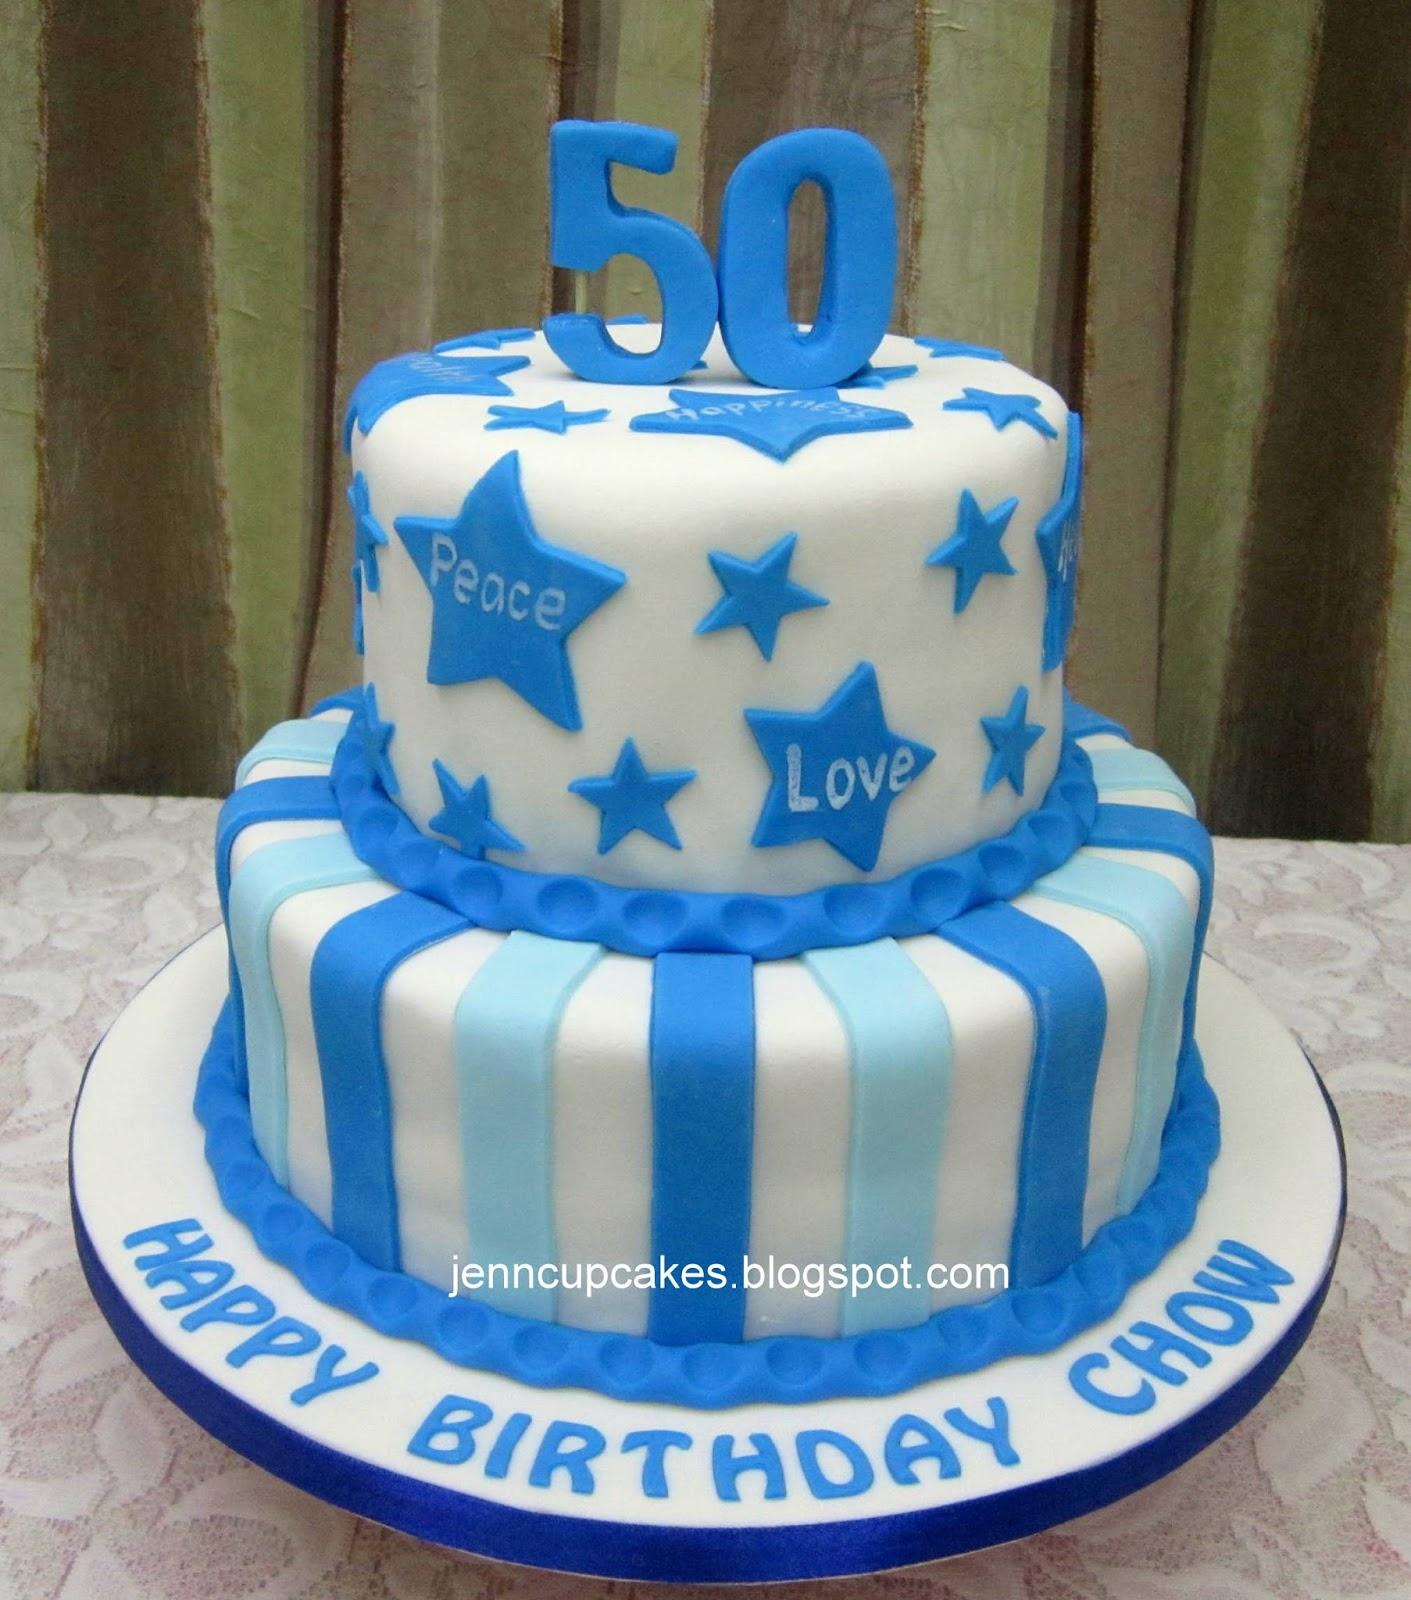 5kg Cake Images : Jenn Cupcakes & Muffins: 50th Birthday Cake